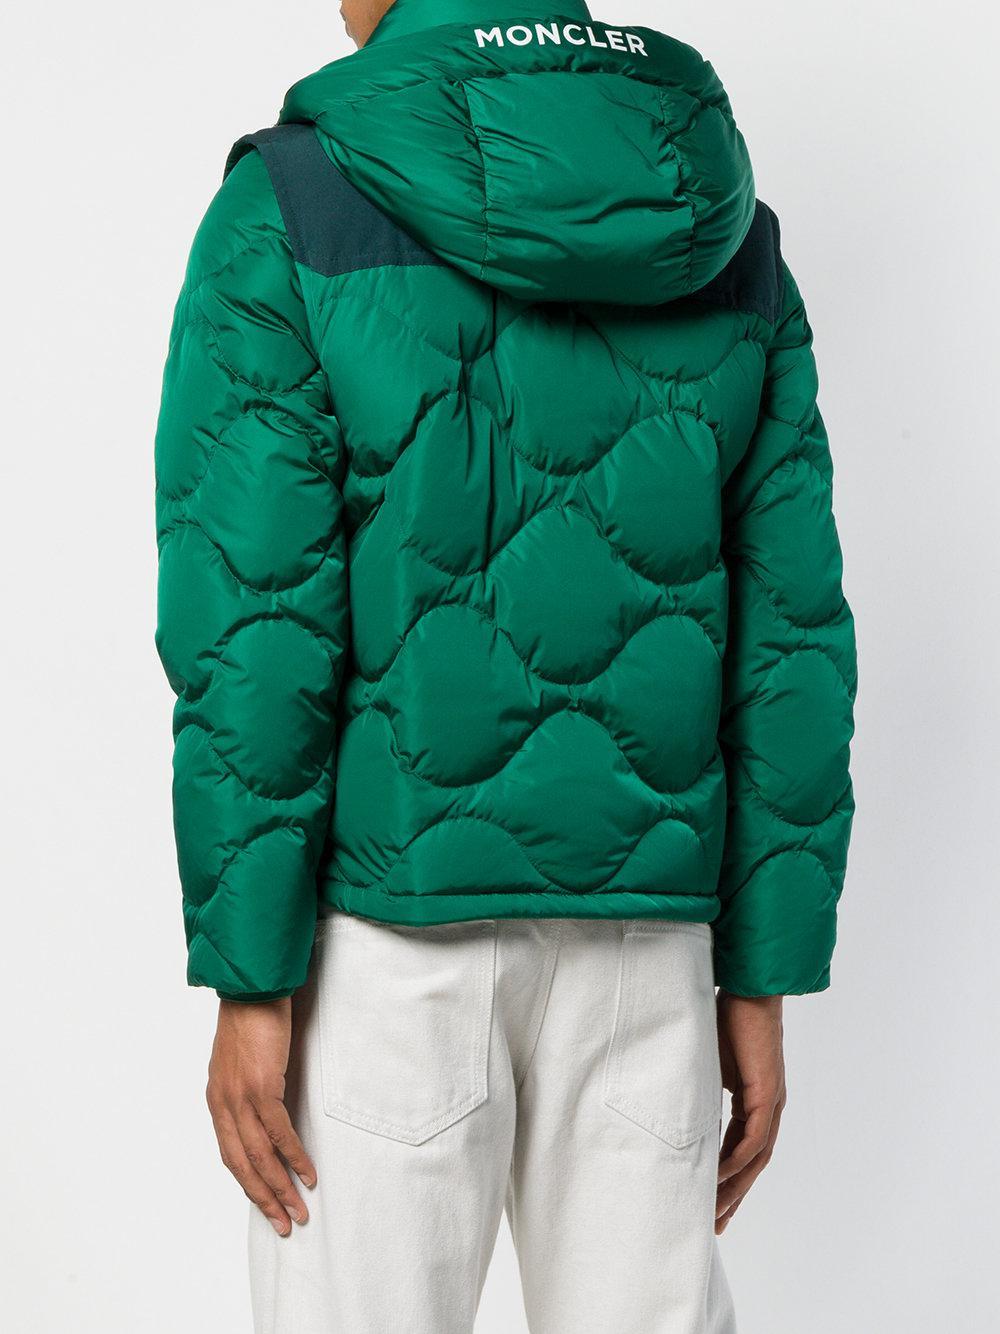 87715be60 Moncler Arles in Green for Men - Lyst